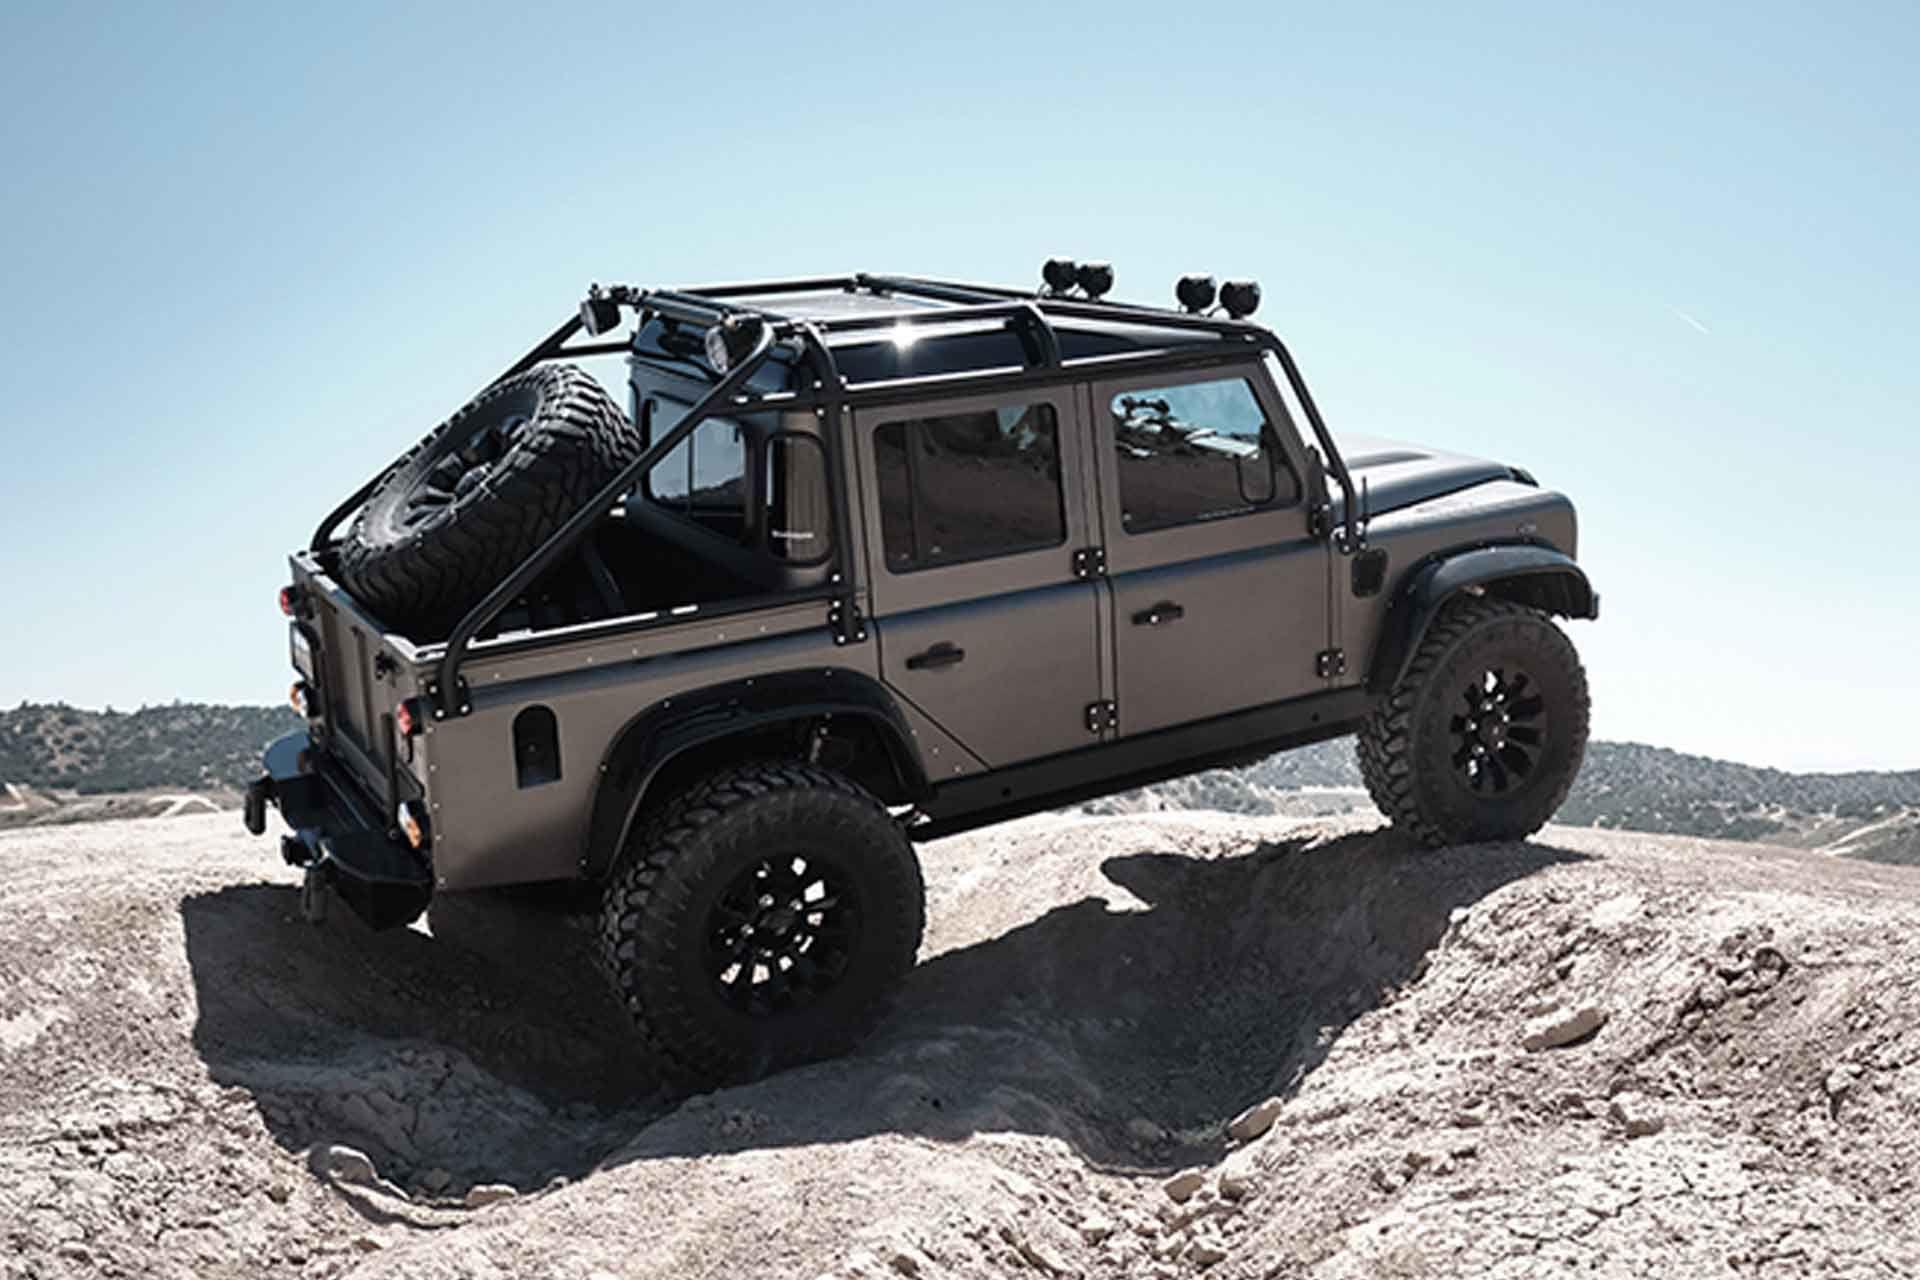 Himalaya Spectre Land Rover Defender Suv Land Rover Defender Land Rover Land Rover Defender 110